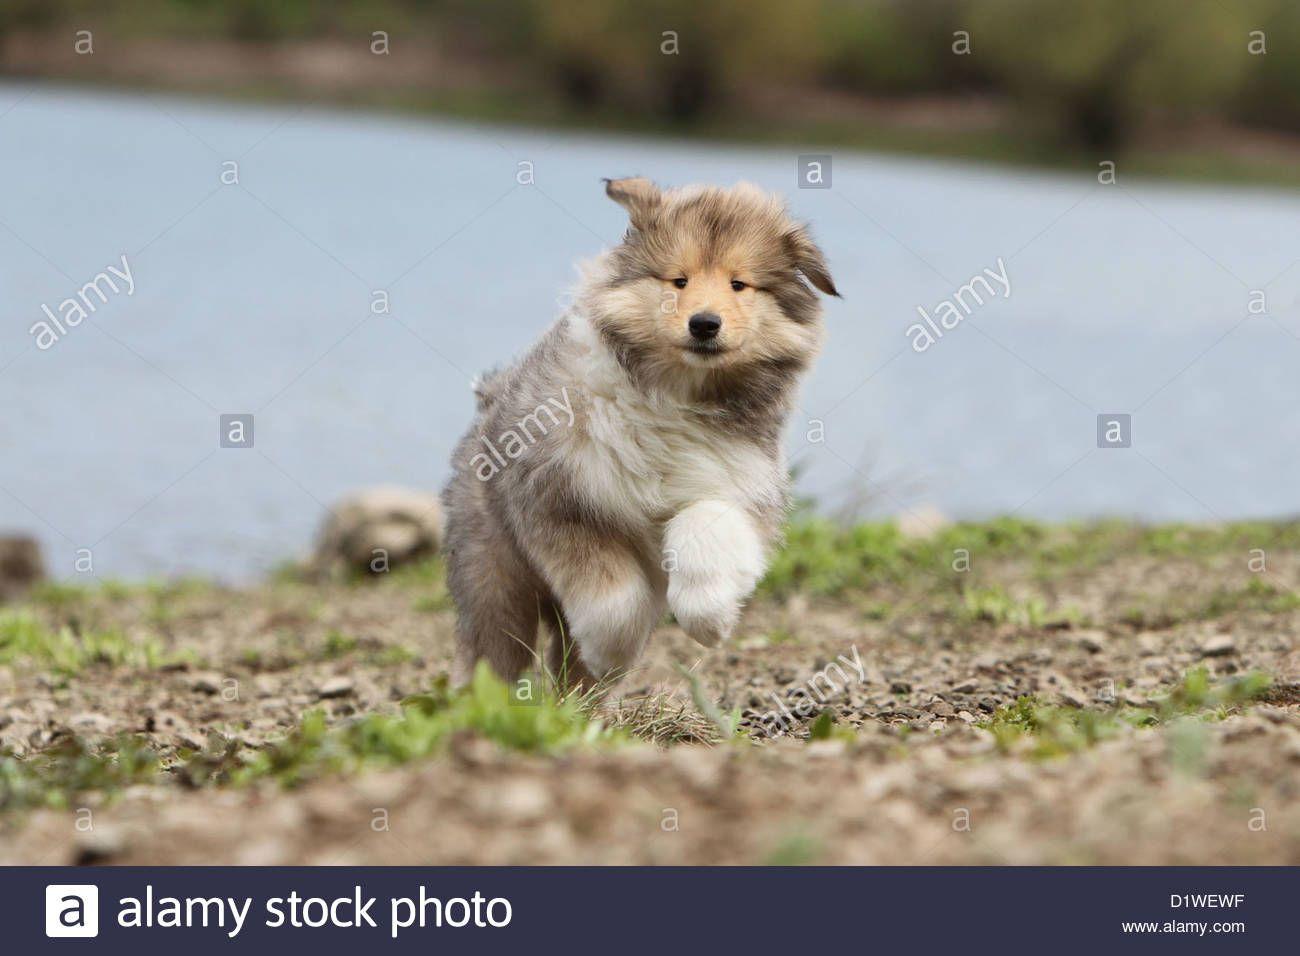 dog-rough-collie-scottish-collie-puppy-sable-white-running-on-the-D1WEWF.jpg (1300×956)